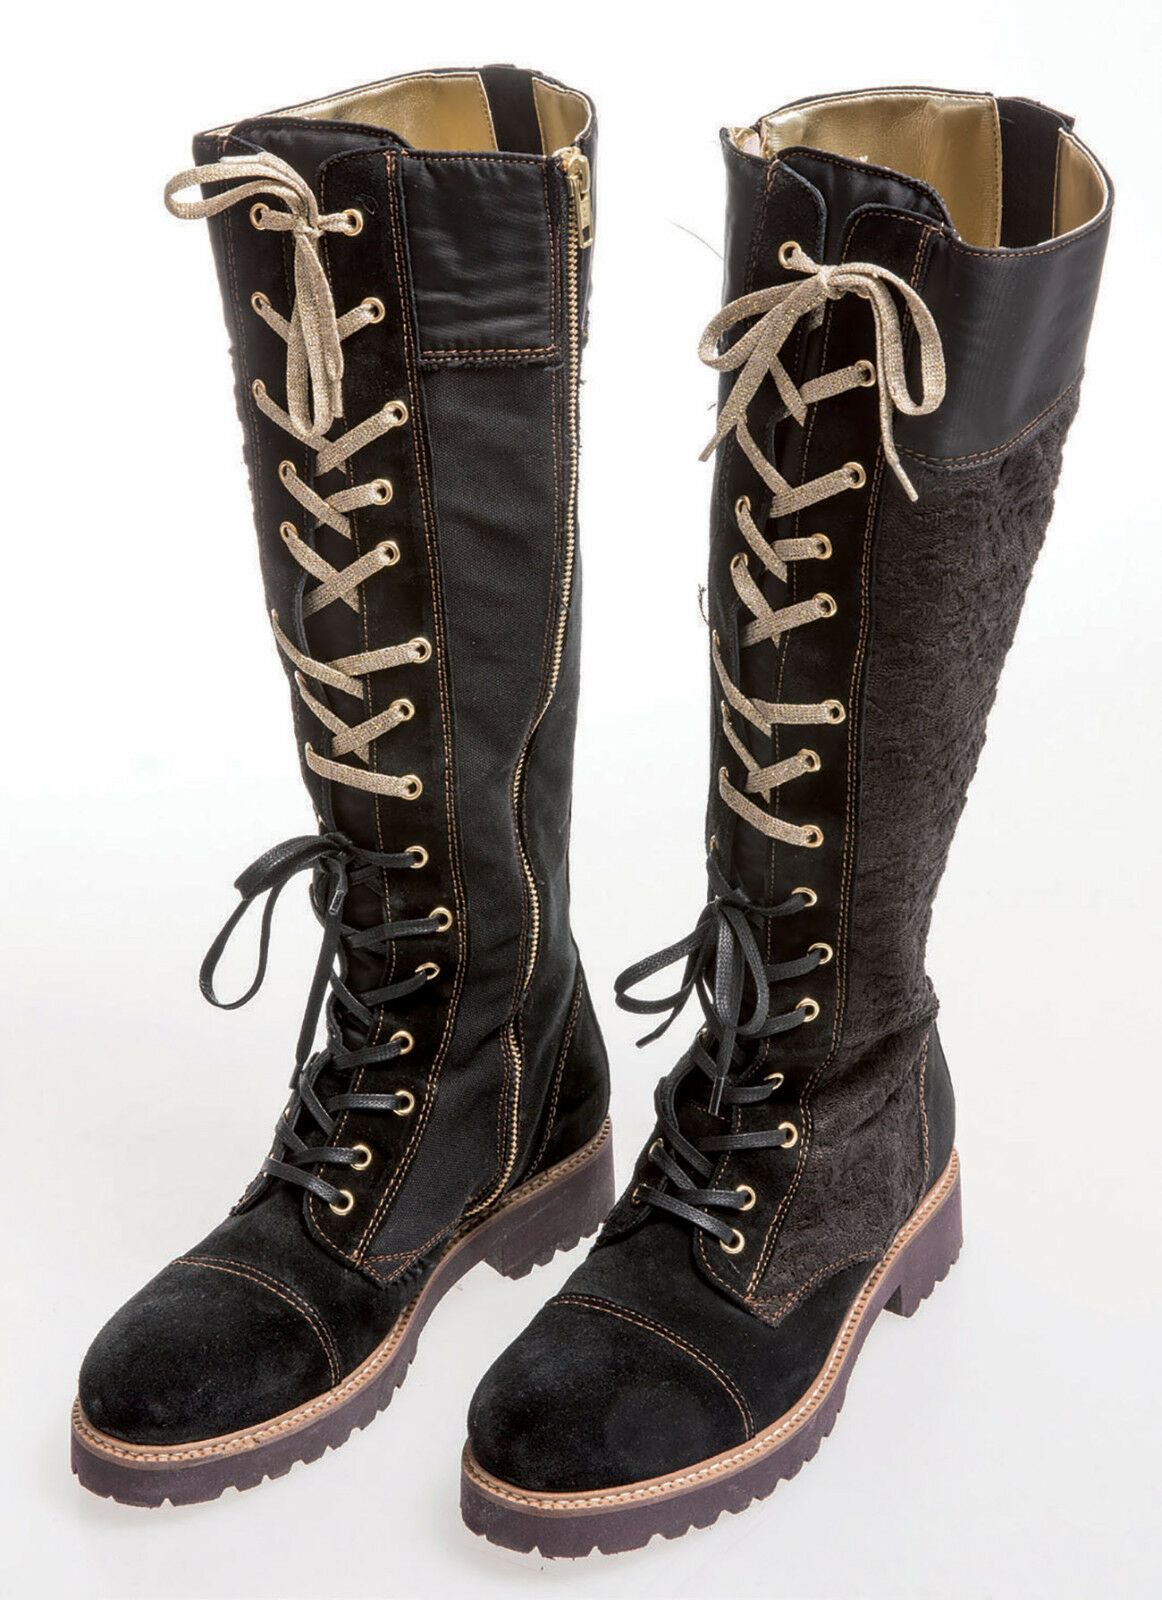 Elisa Cavaletti bota botas   Biker Biker Biker zapatos negro talla 40  Echt Leder   saludable